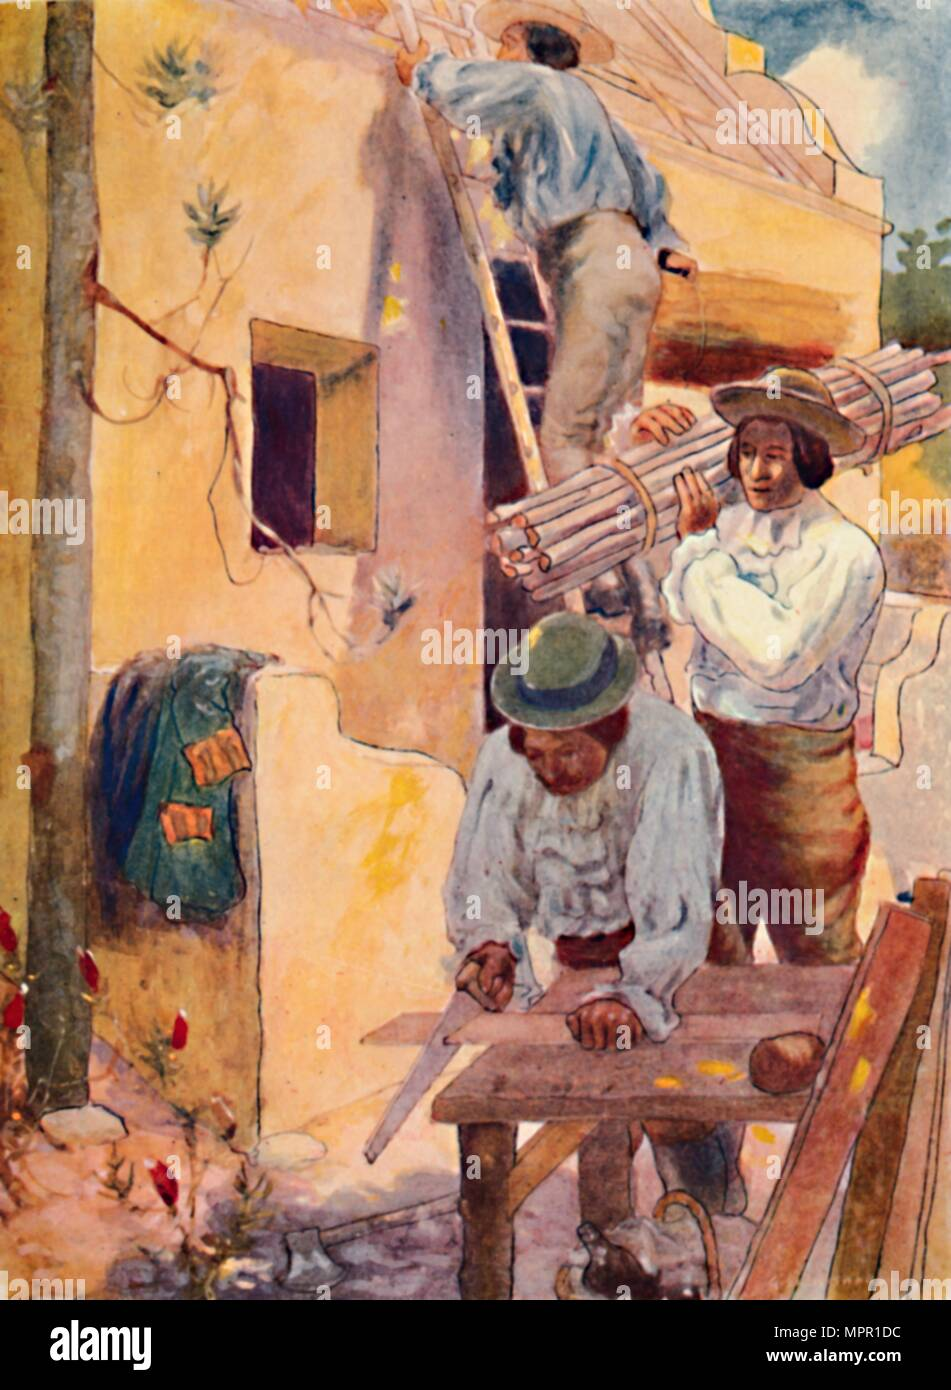 'Huguenots Building their Homesteads', 1909. Artist: GS Smithard. - Stock Image